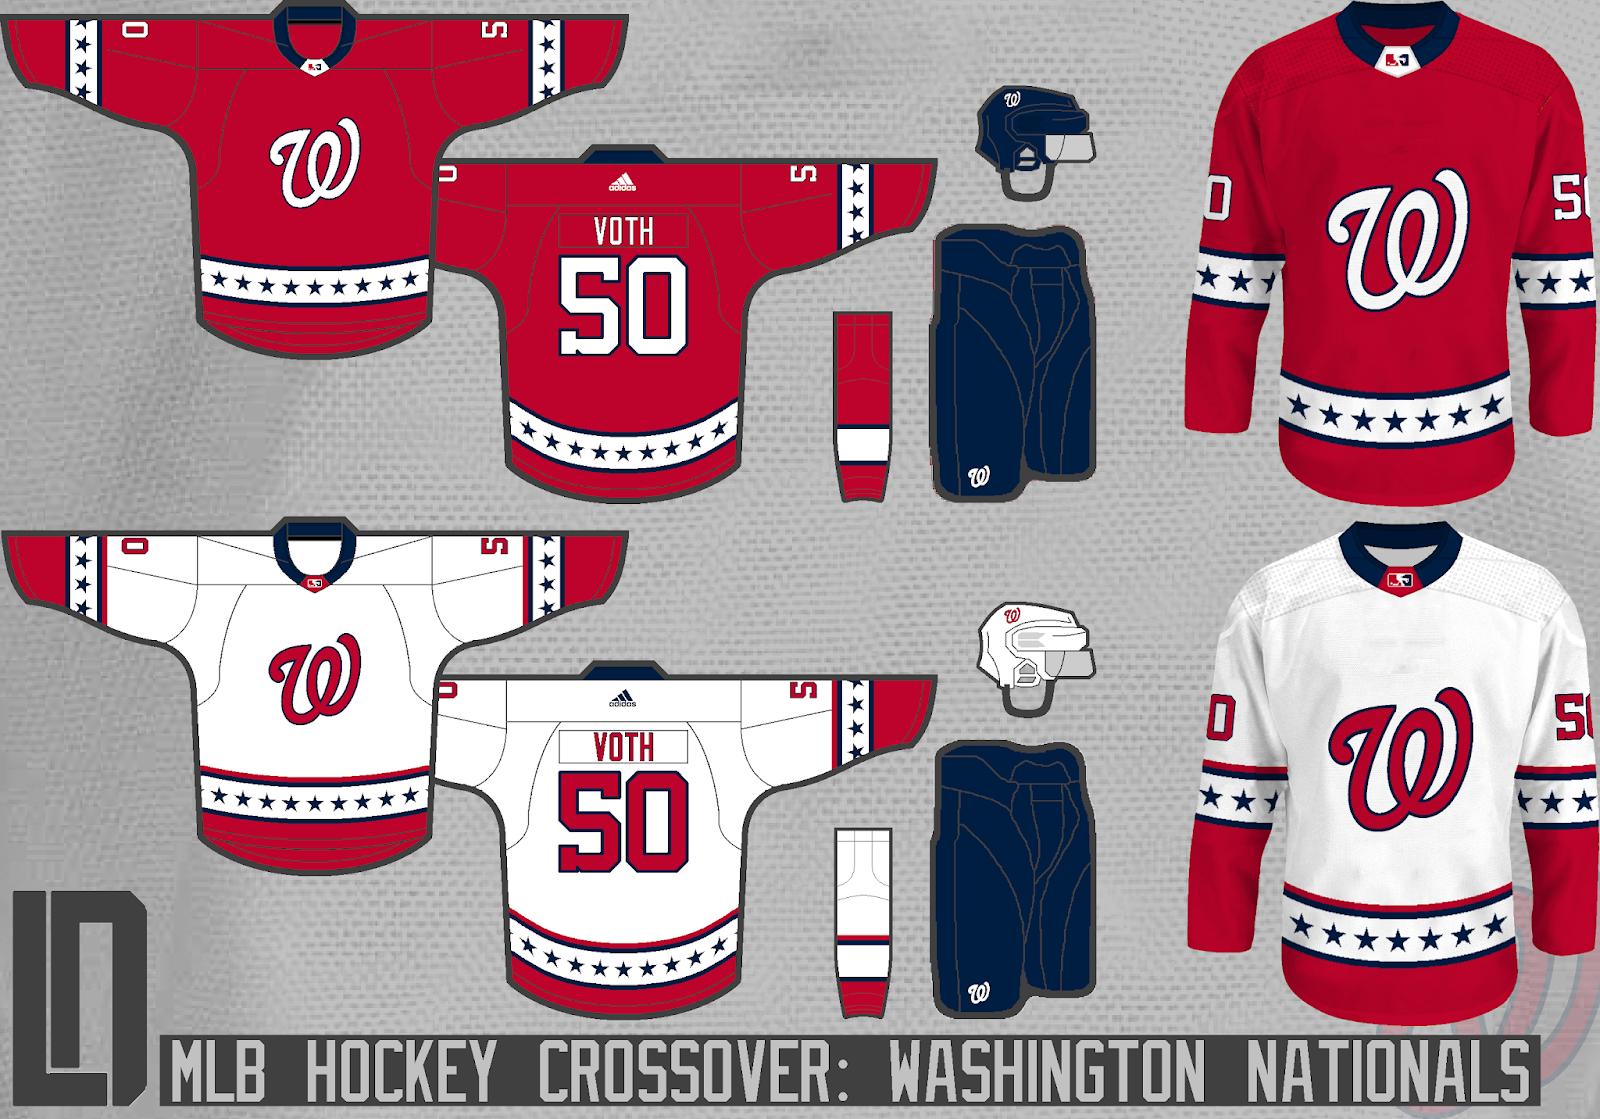 Washington+Nationals+Concept.png